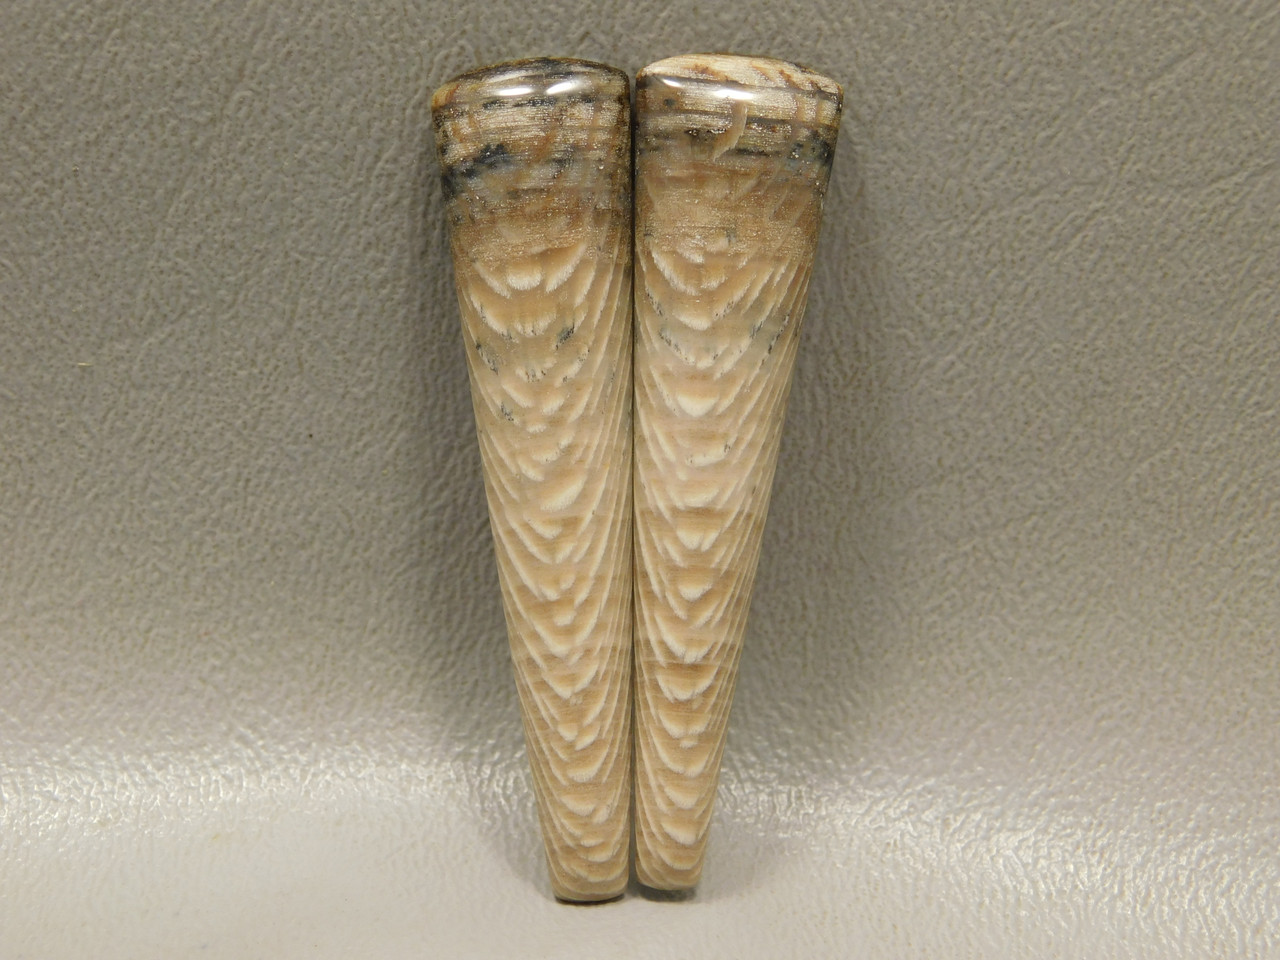 Petrified Sycamore Wood Matched Pair Long Drops Cabochons #14